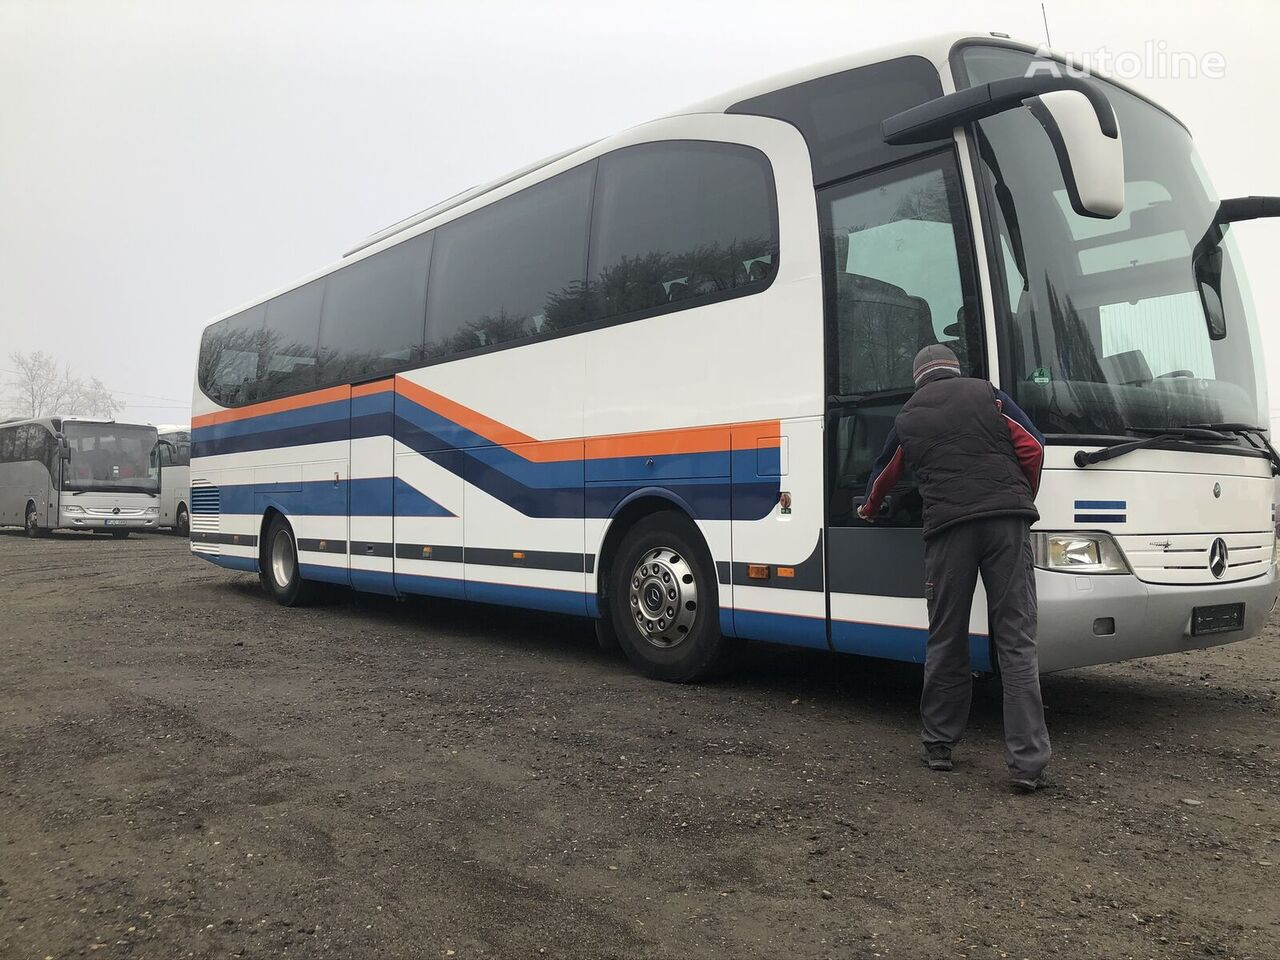 MERCEDES-BENZ Travego 15 RHD Polaris coach bus